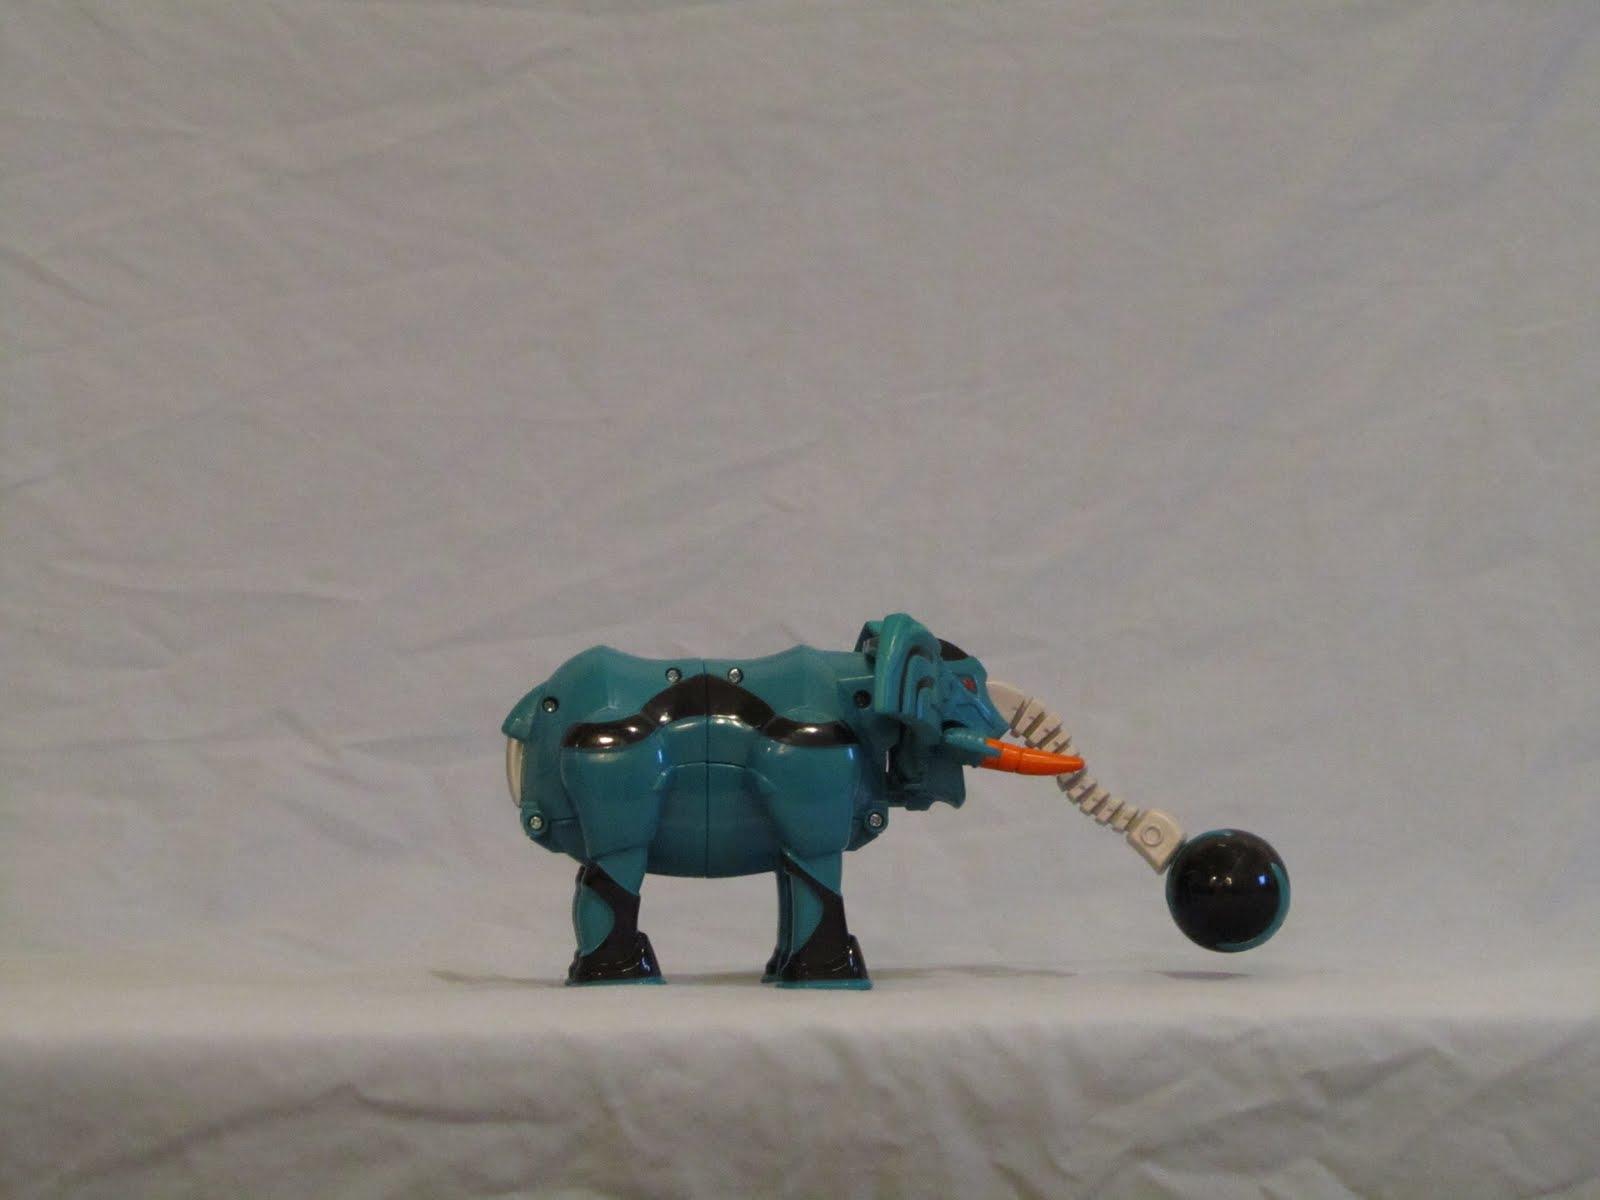 EuiKid's Ebay: PRJF Shark/Bat/Elephant Zords